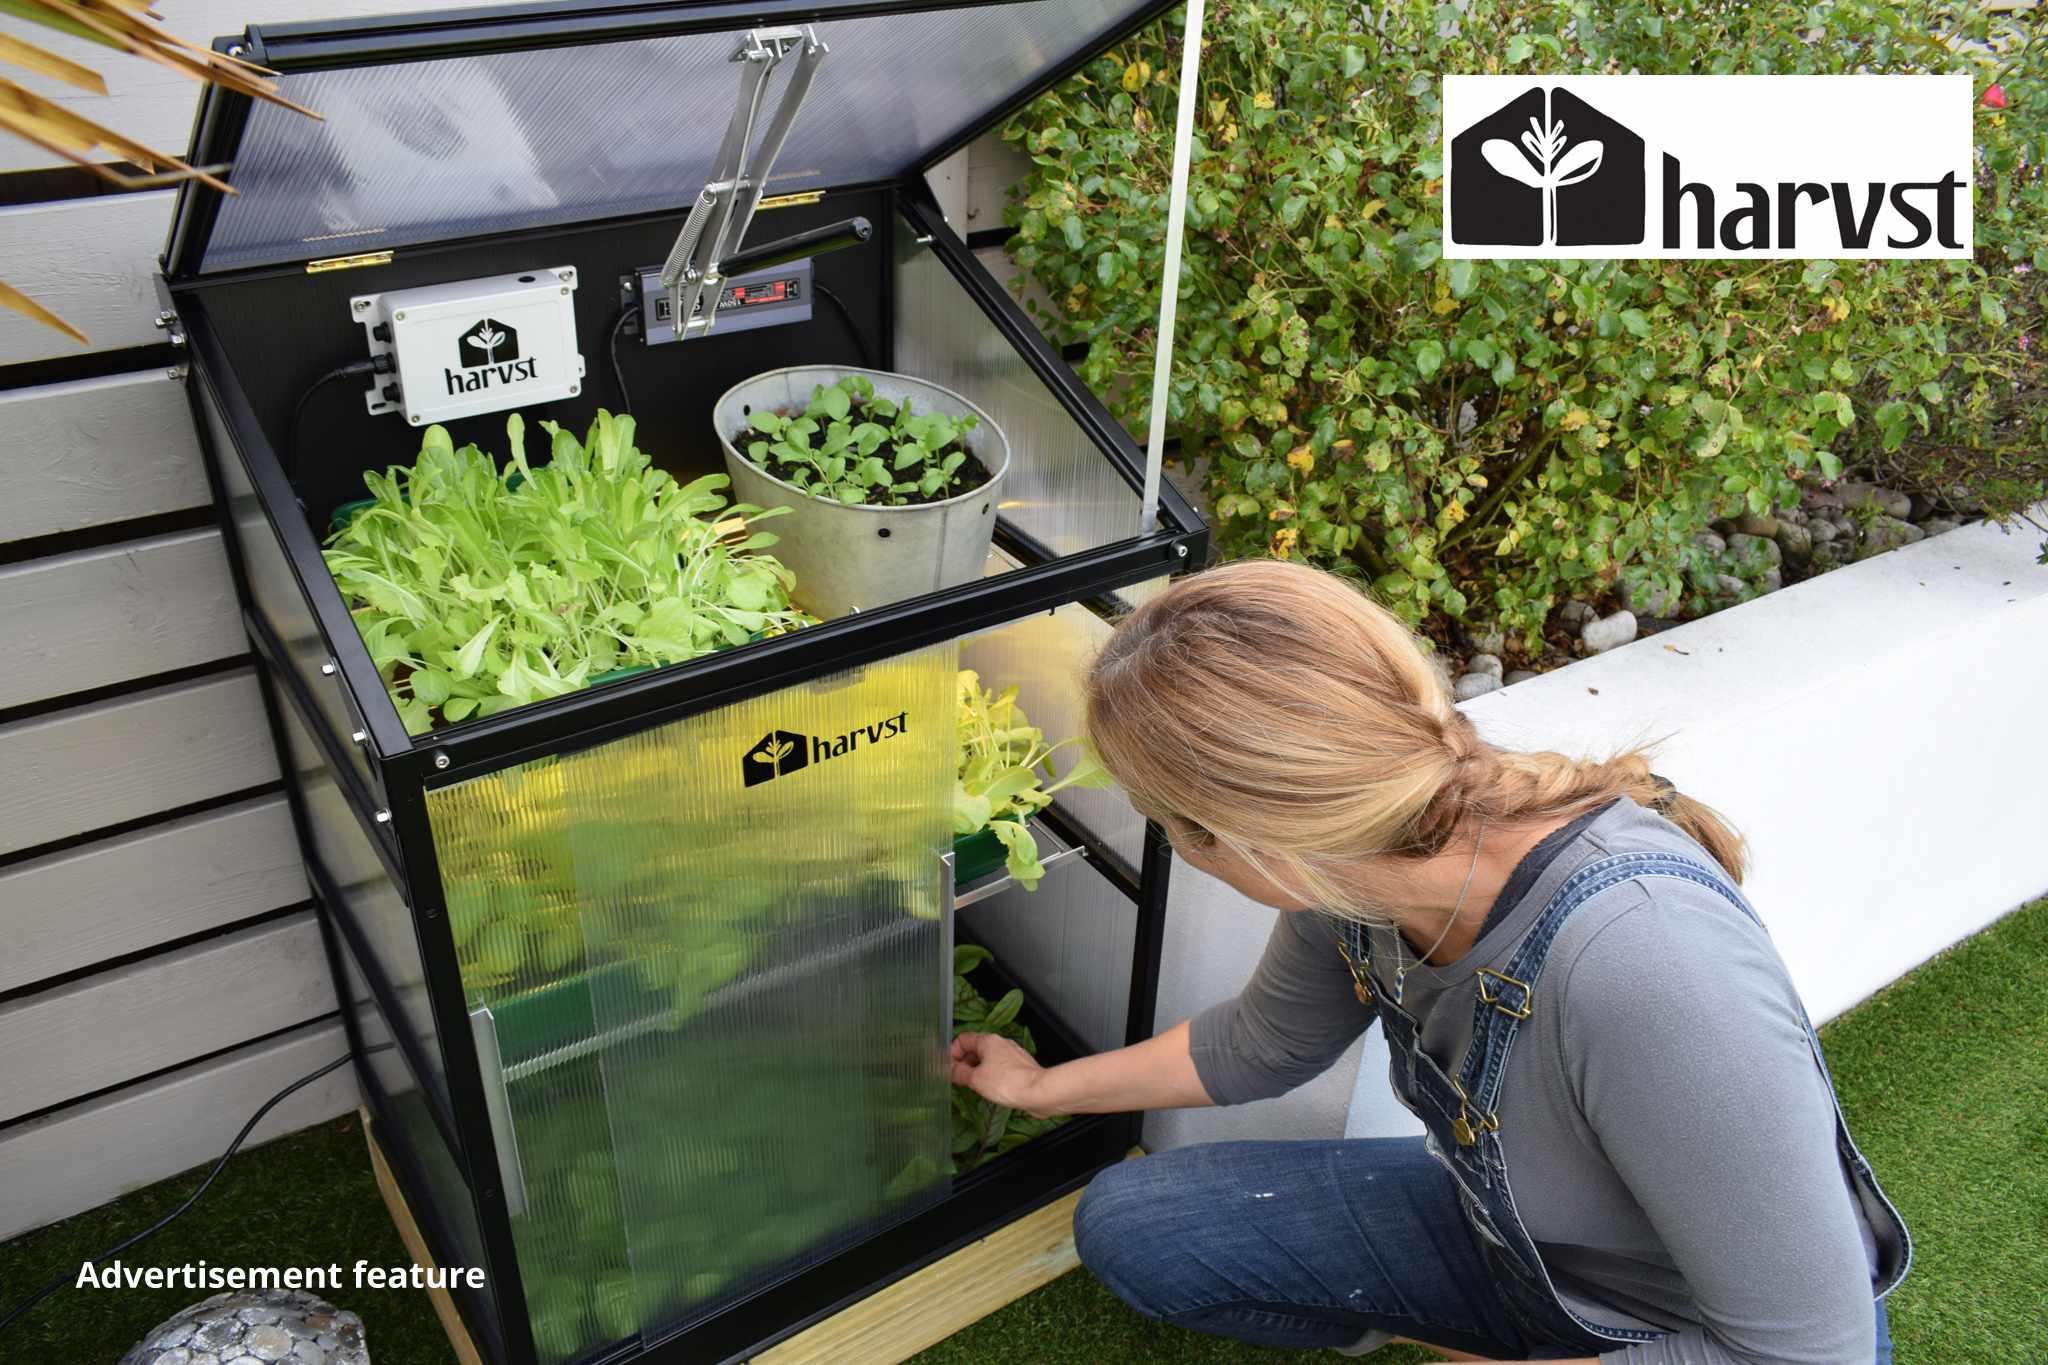 Win a Harvst greenhouse